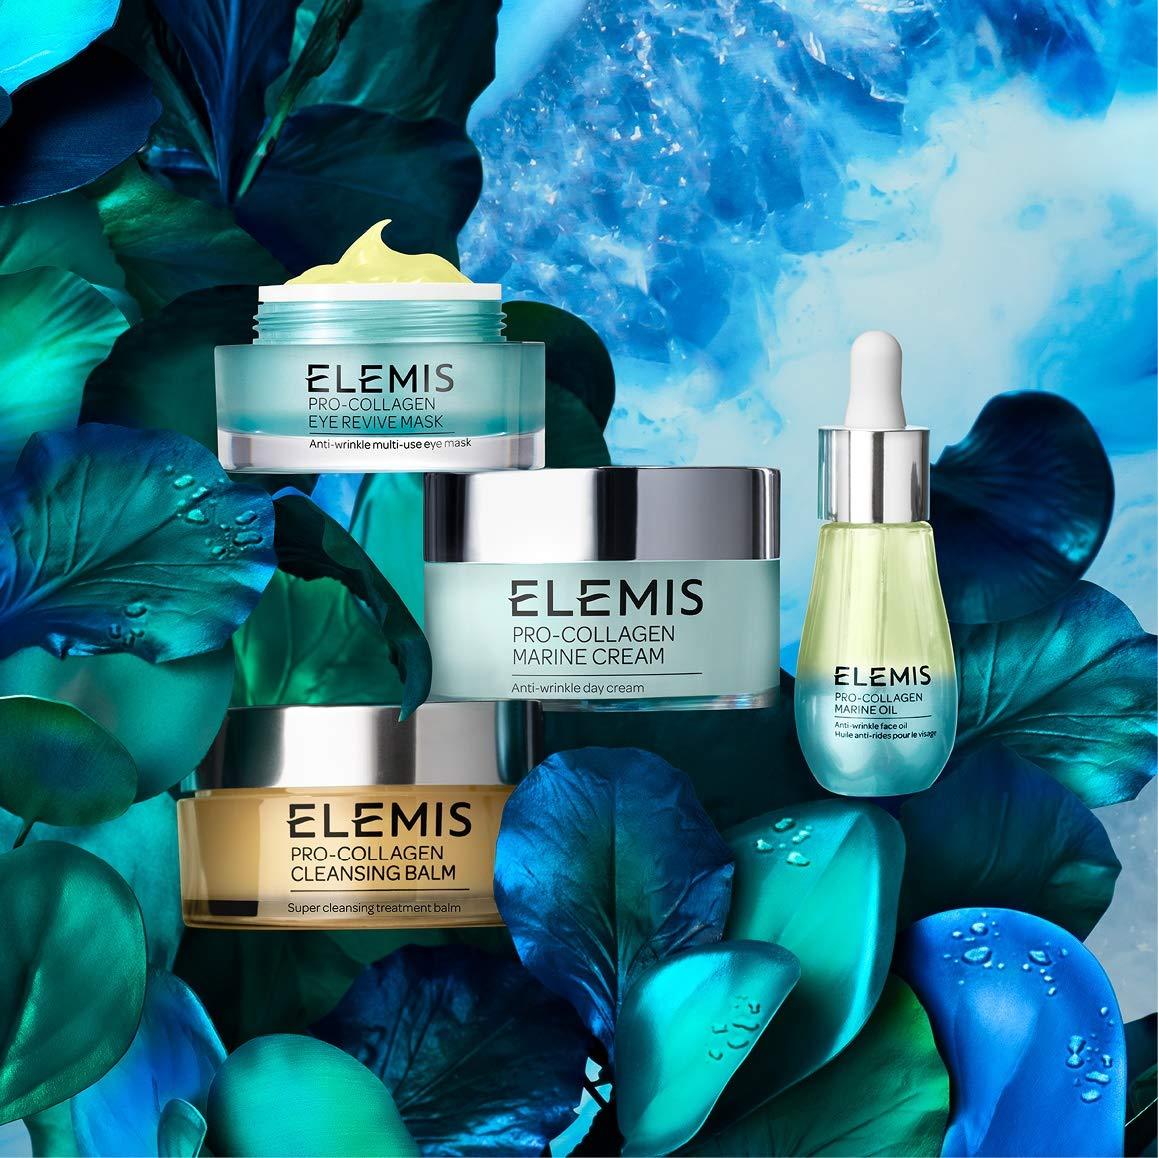 Elemis Pro Collagen Eye Revive Mask